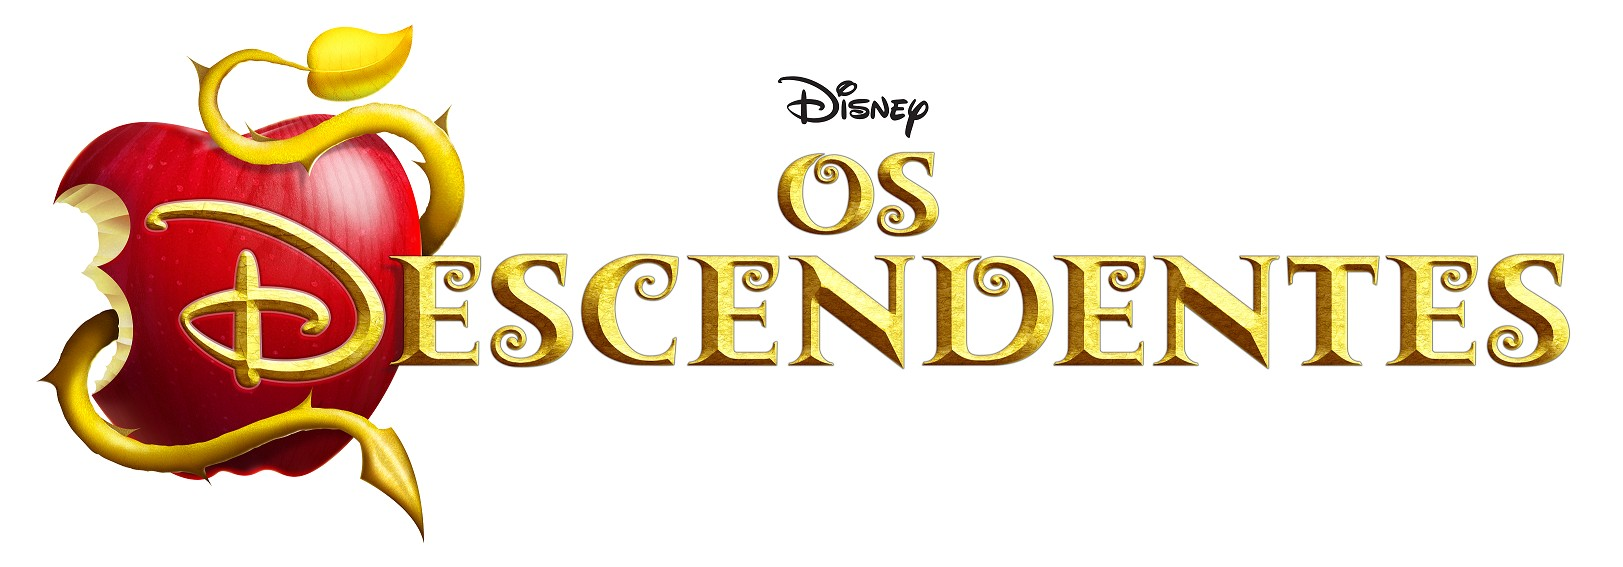 Disney Channel_logo Os Descendentes